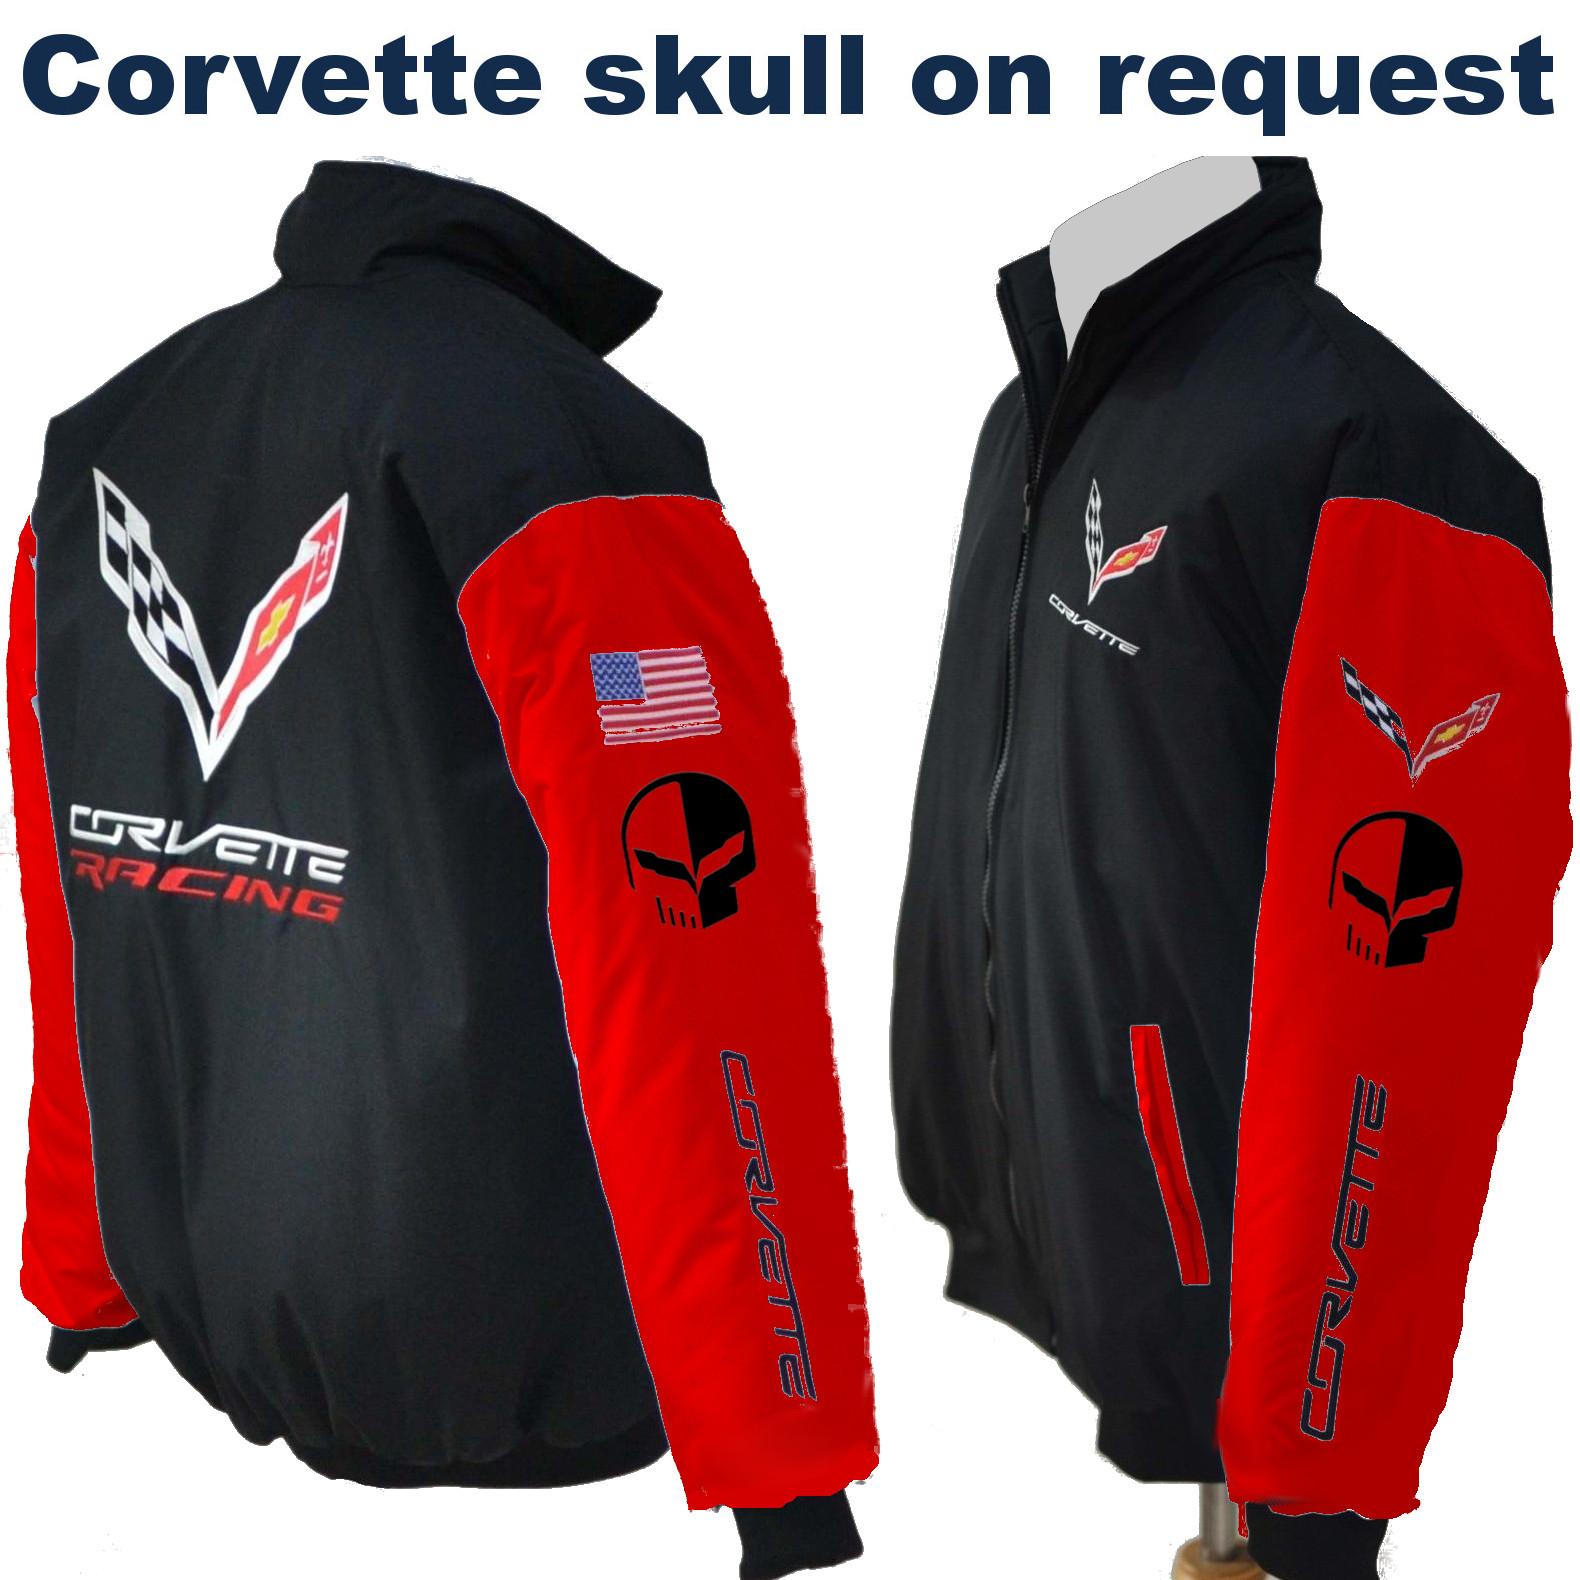 size 40 48260 f8158 CORVETTE-C7-(Skull)-RACING - Jacke // CORVETTE-C7-RACING - Jacket //  black-red from Pro Fashion